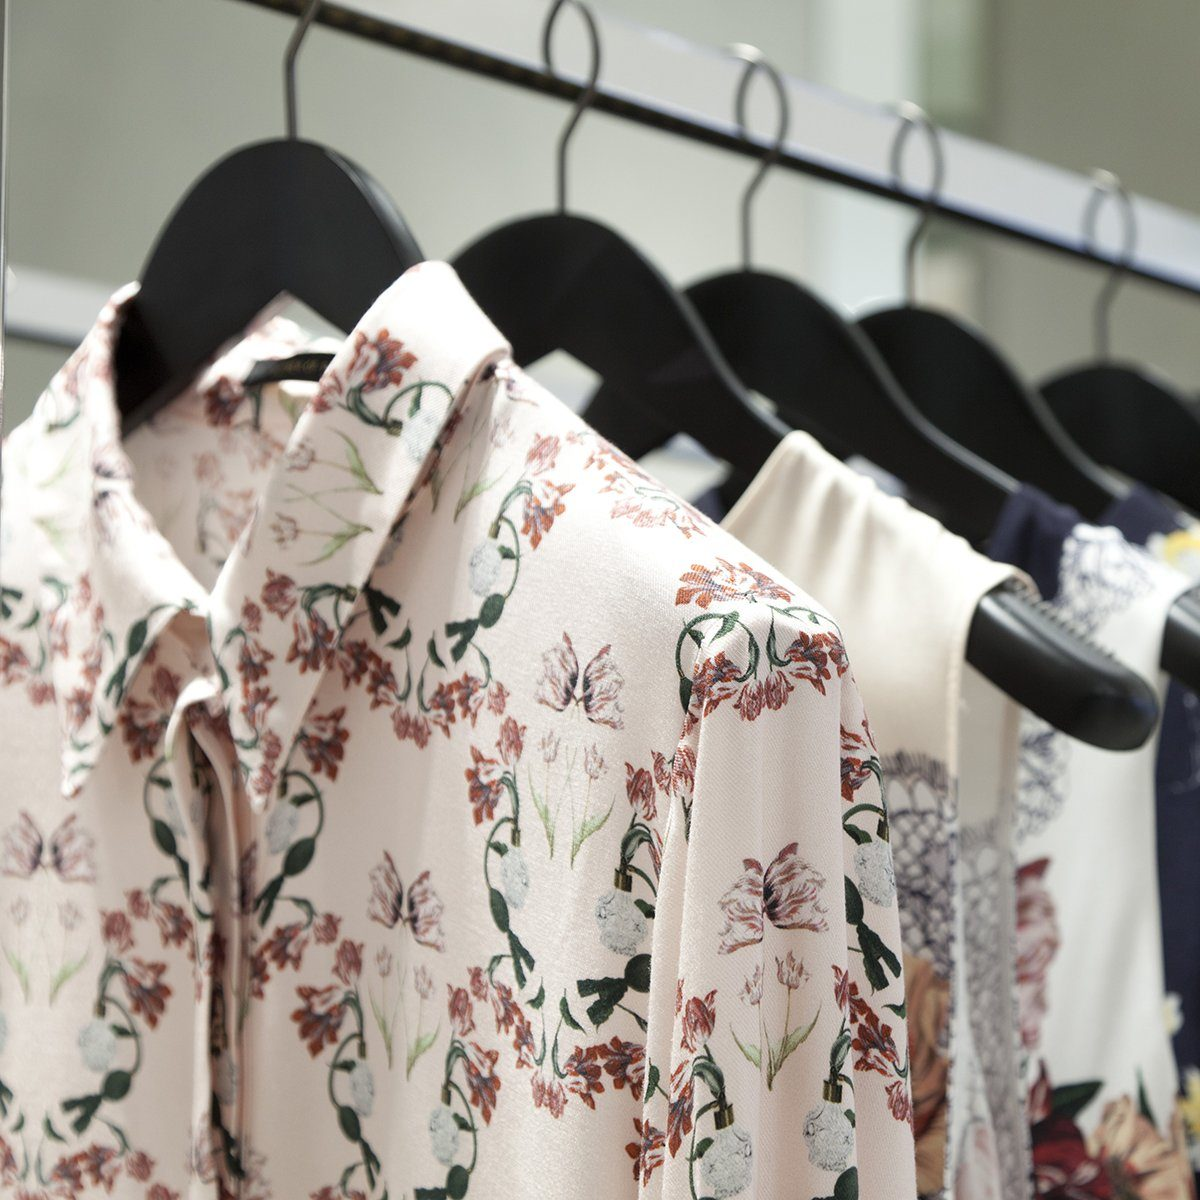 woman blouse hangs on a hanger